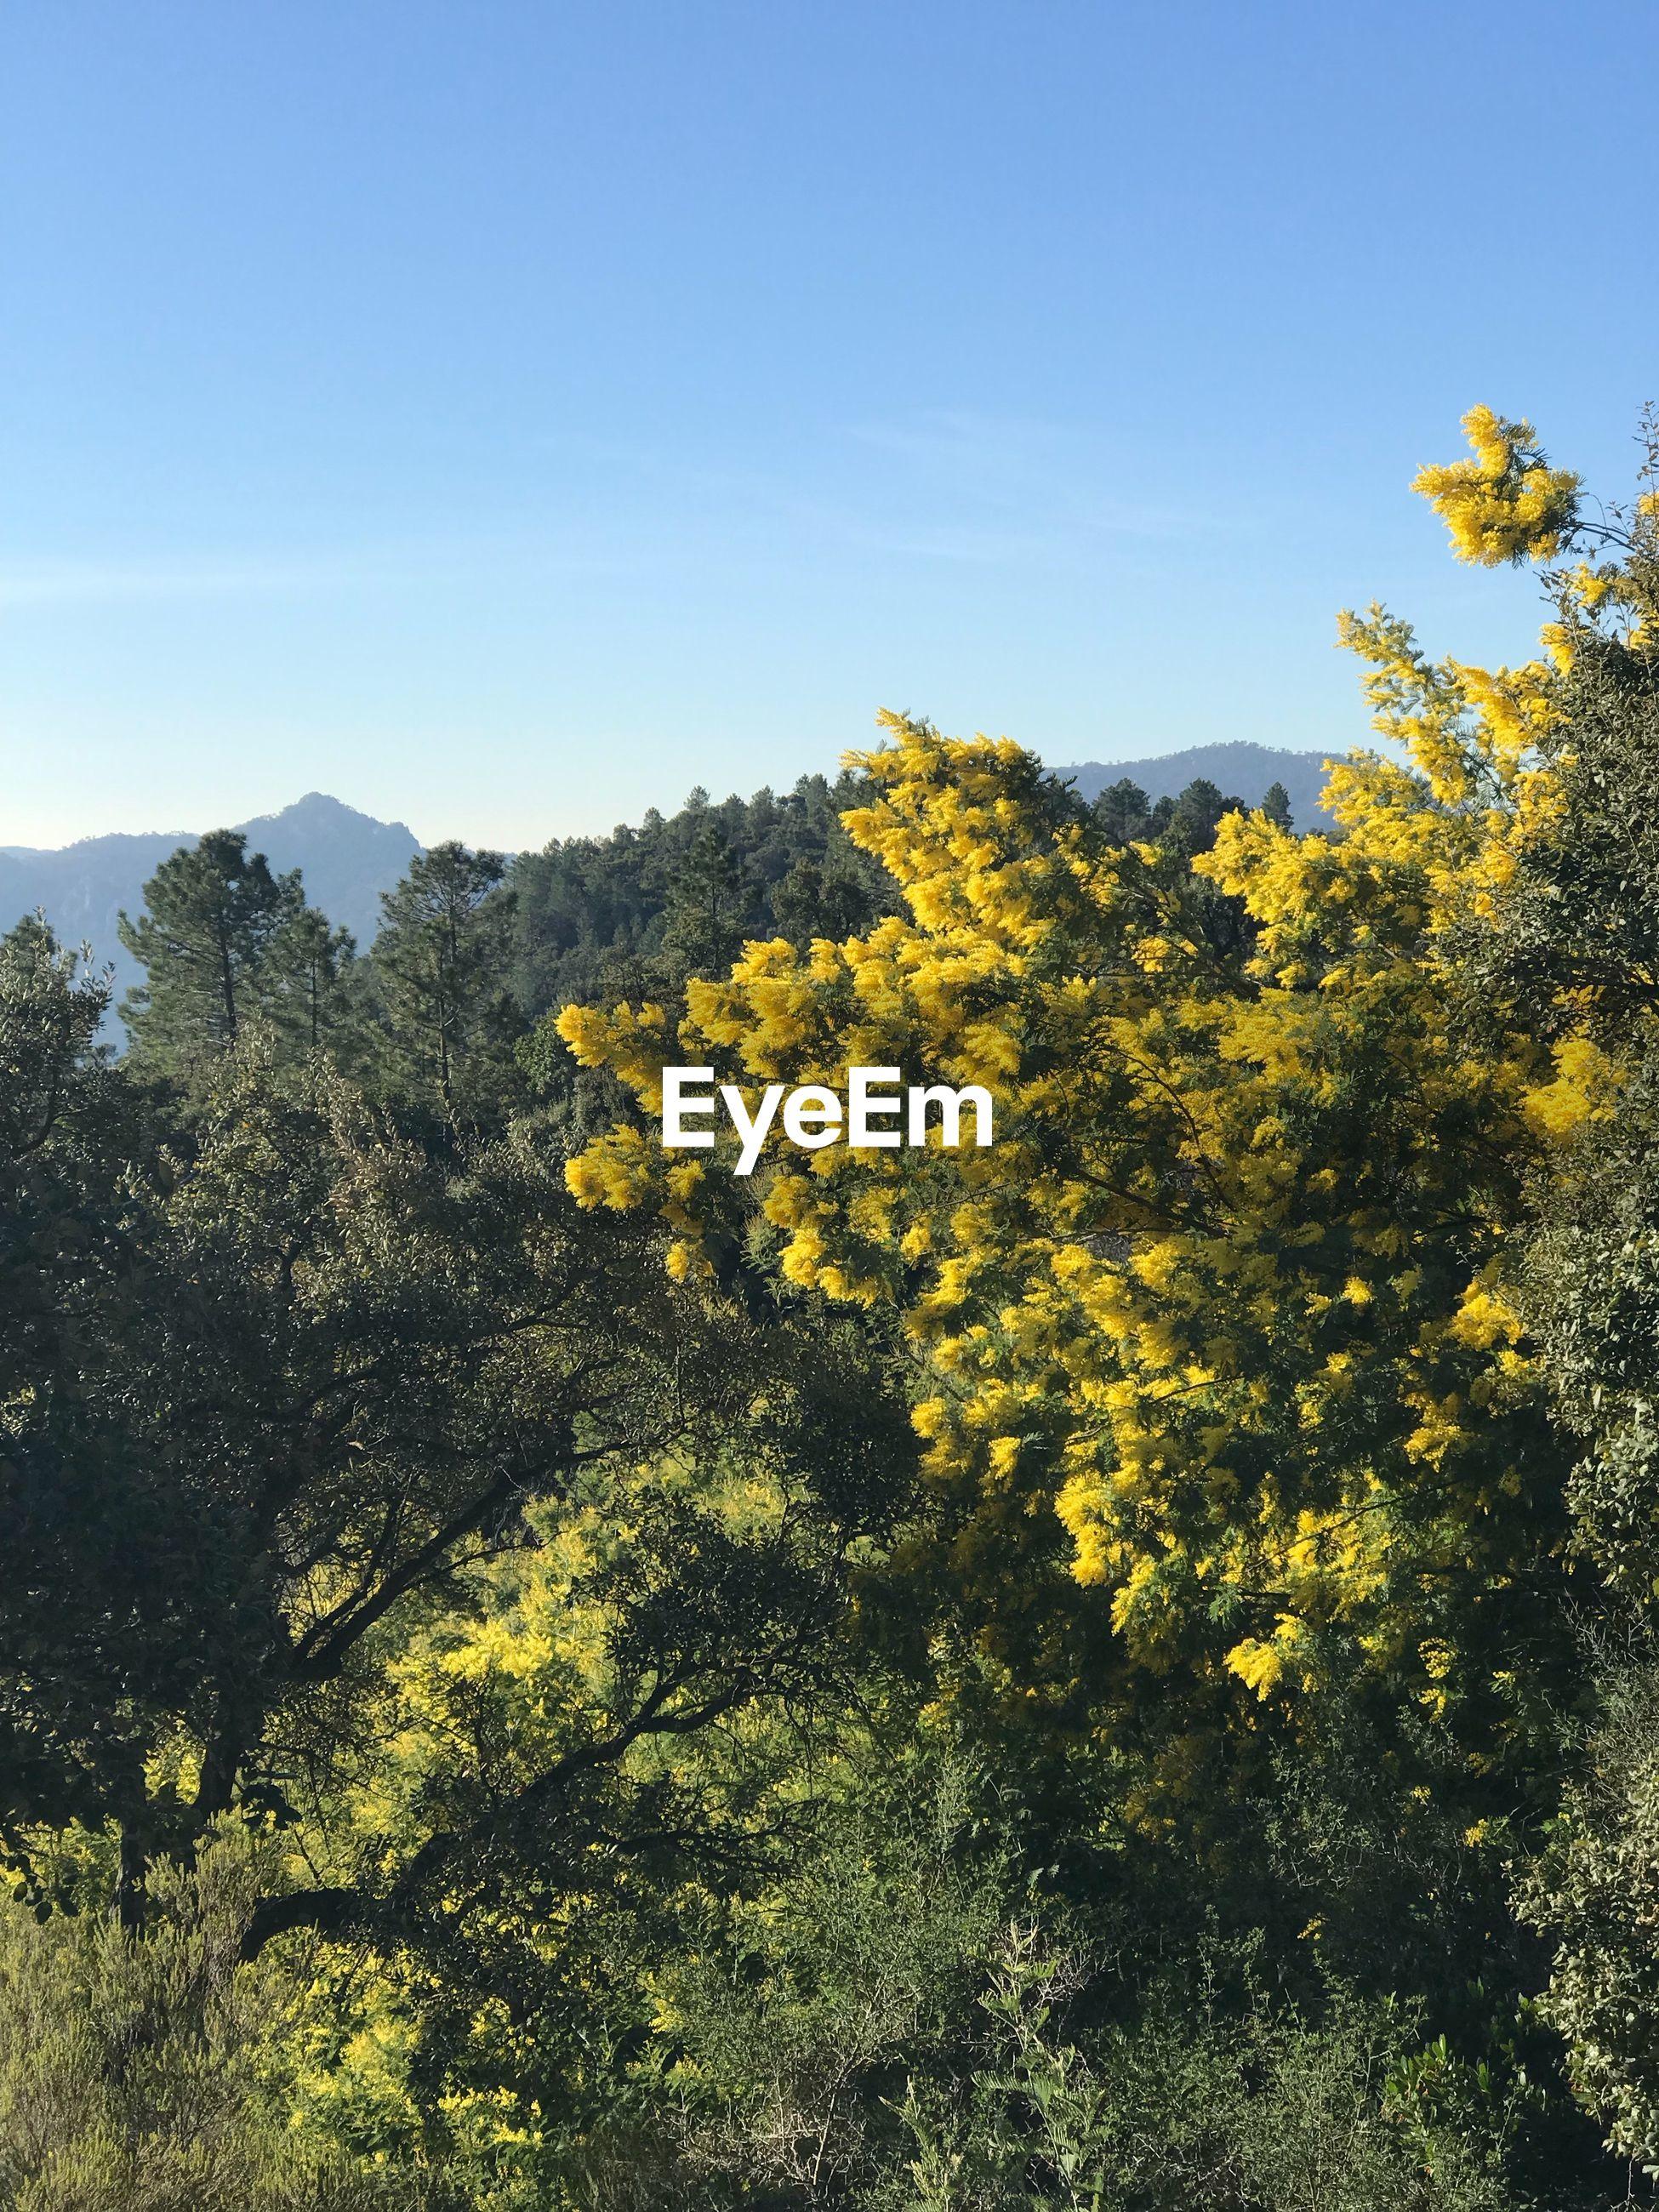 YELLOW FLOWERING PLANTS AGAINST SKY